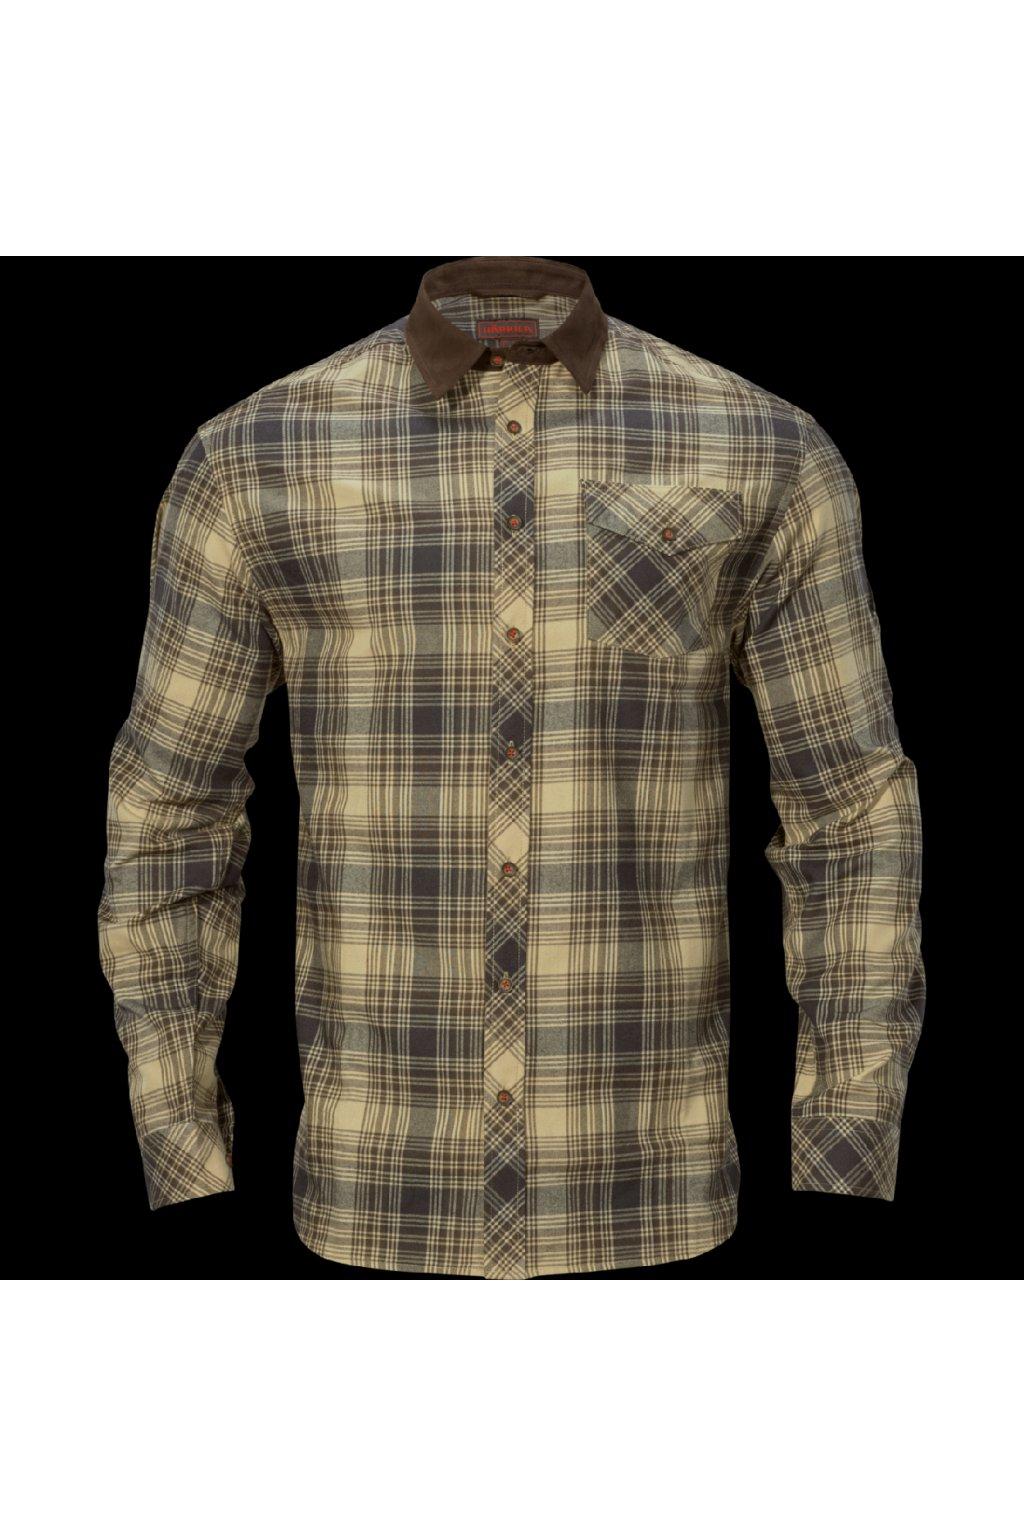 HÄRKILA  - Driven Hunt flannel košile Light teak check